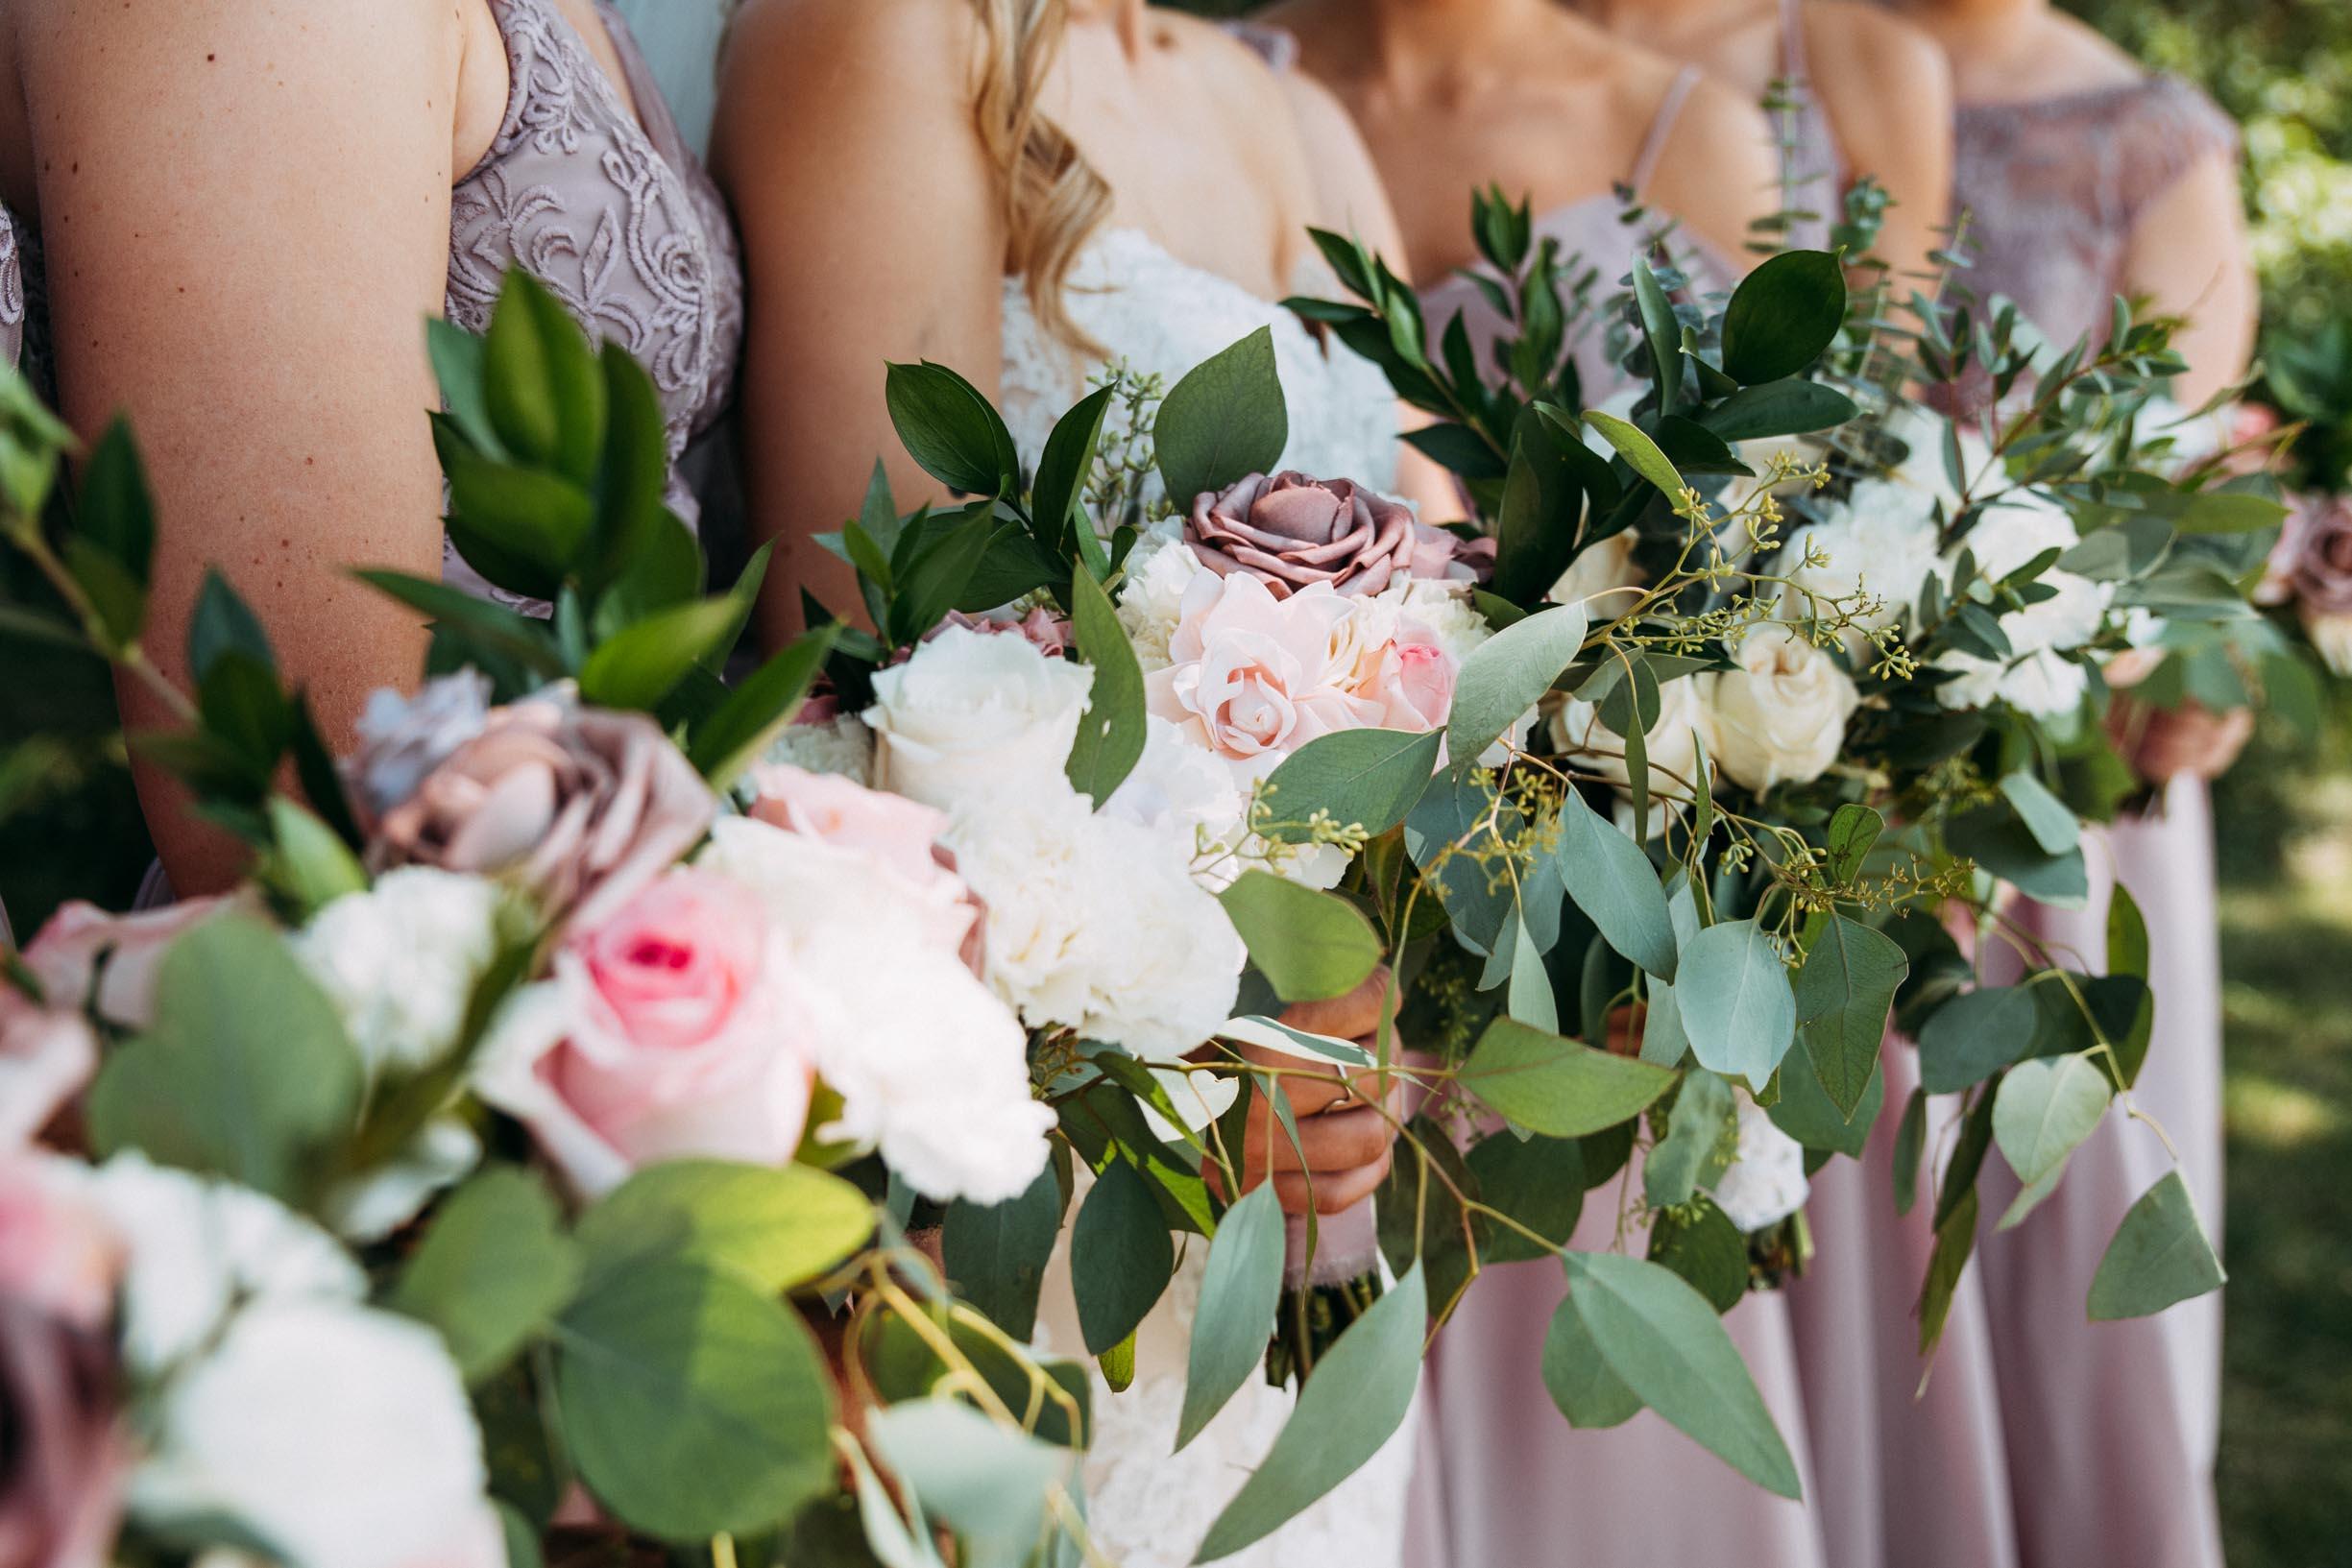 32-WeddingsattheBroz_Minnesota_WeddingBlog_WeddingParty.jpg